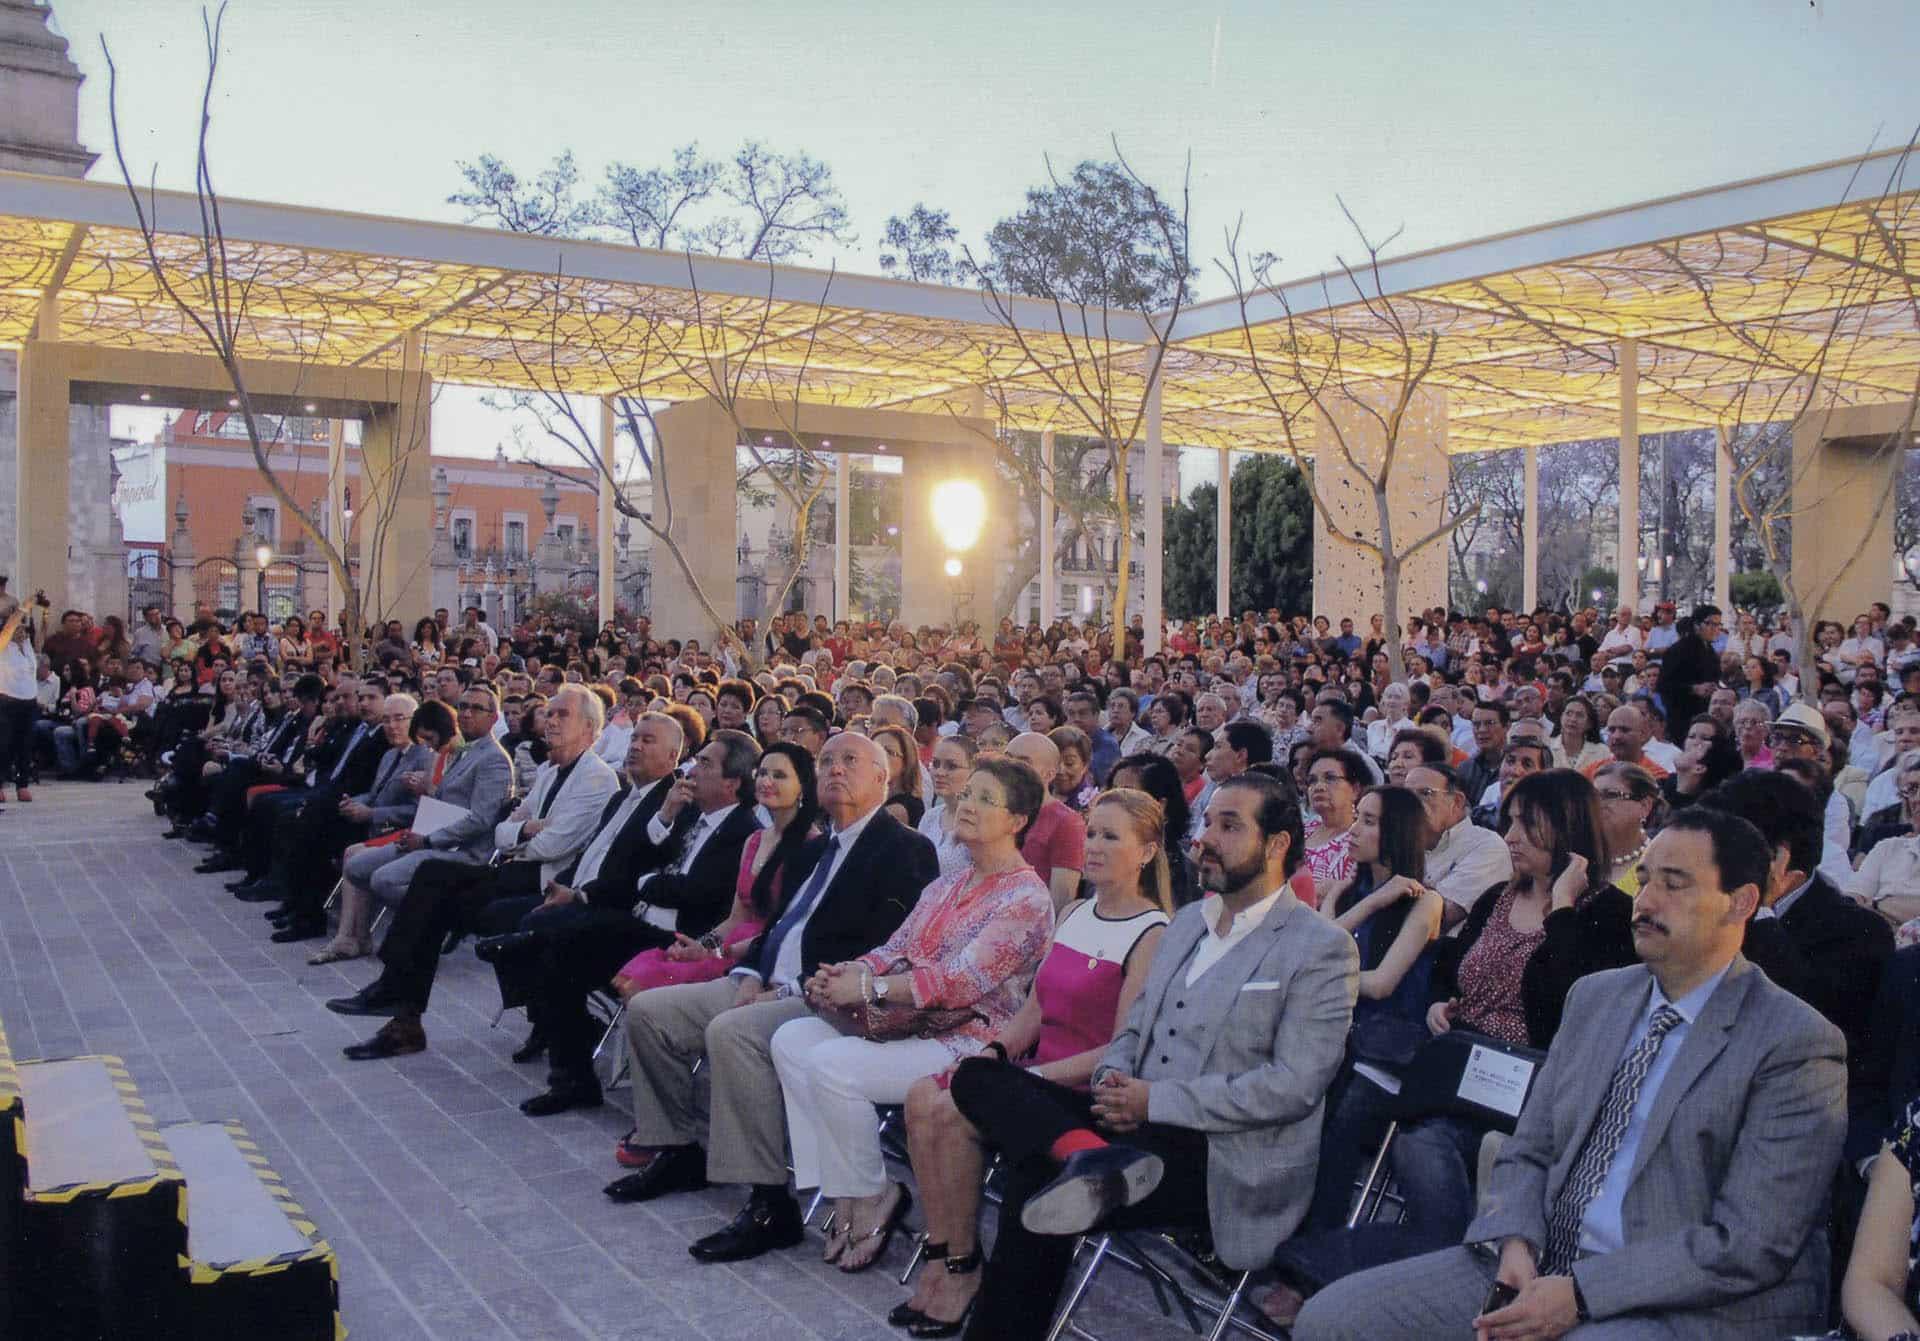 Opening gala event for the Patio de las Jacarandas in Aguascalientes, Mexico.